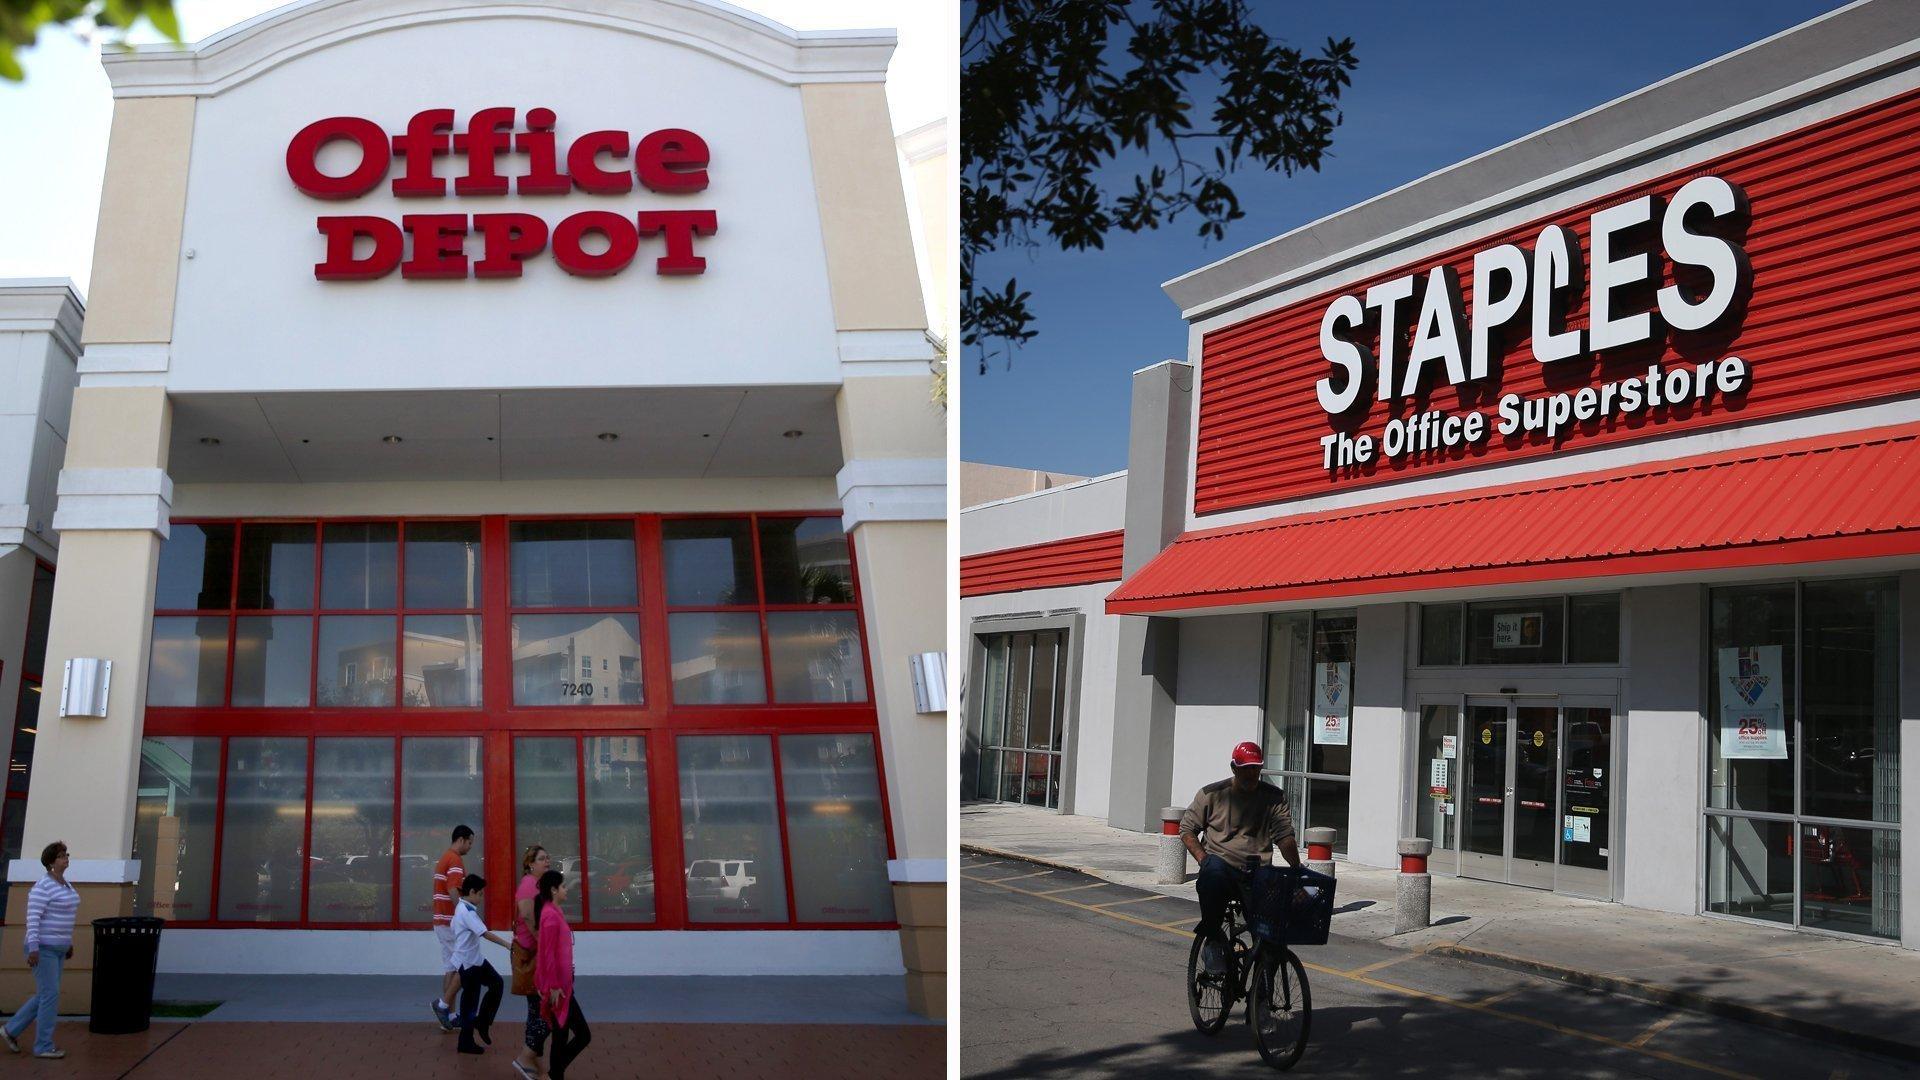 staples buys office depot for 6 billion la times